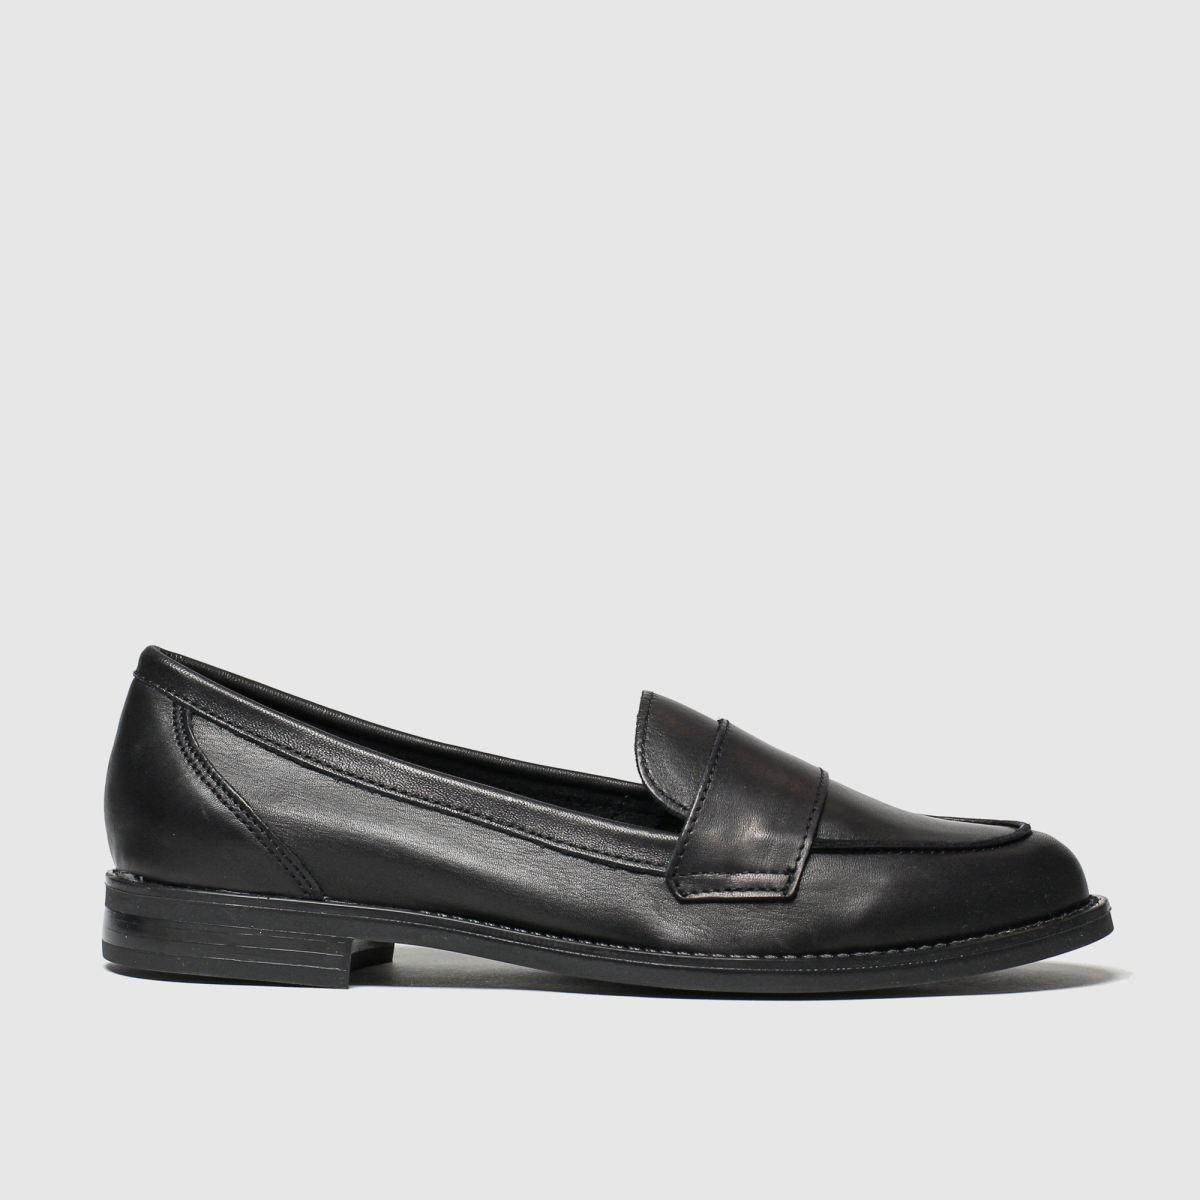 schuh Schuh Black Chronicle Flat Shoes